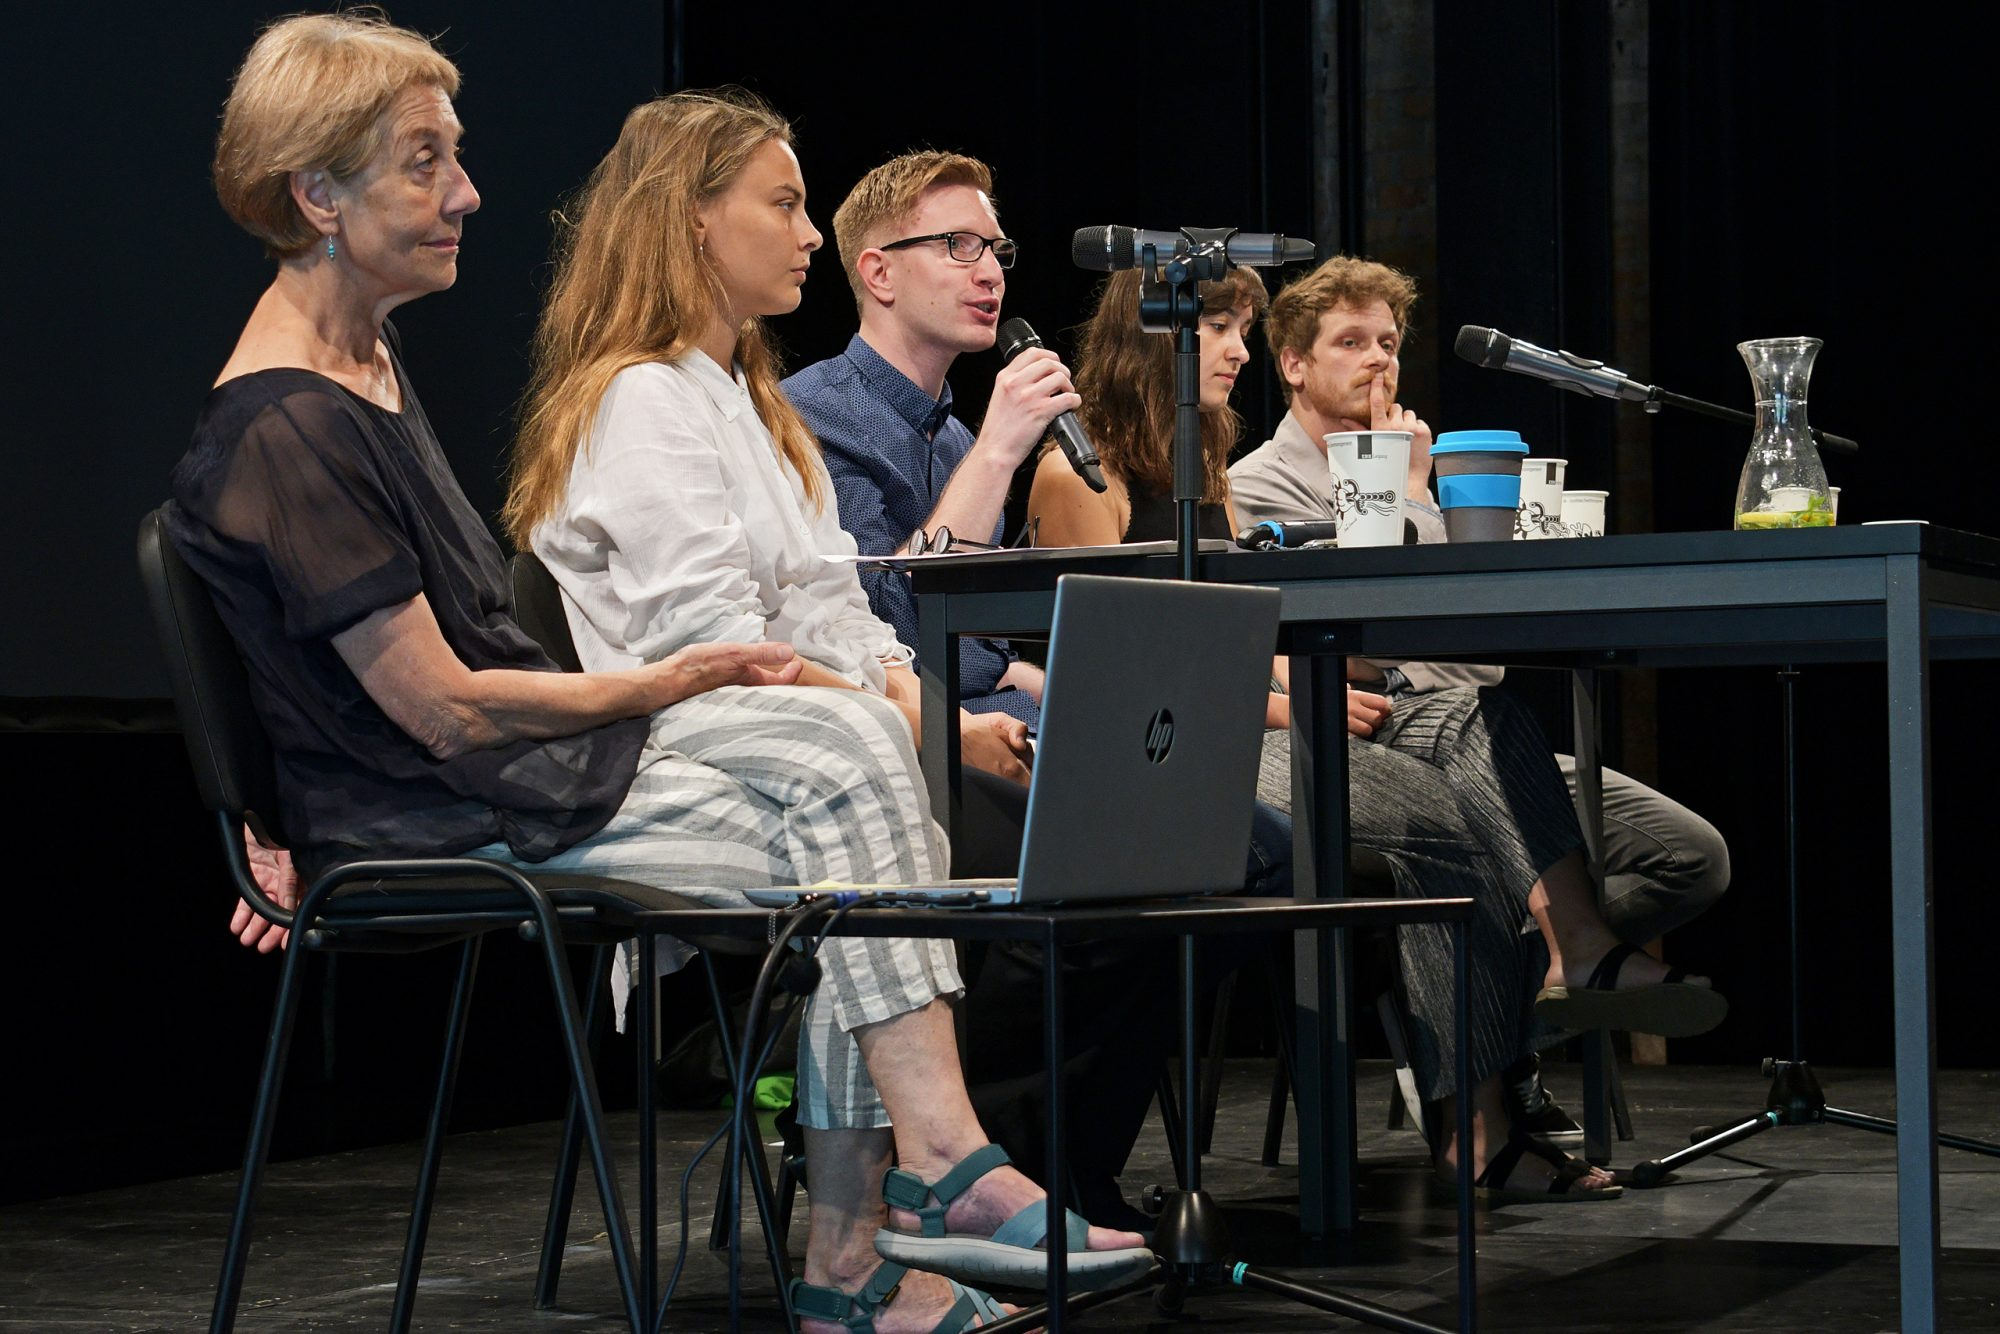 Prof. em. Dr. Gerda Baumbach im Gespräch mit der Leipziger Theatergruppe Compania Sincara. © CCT/Daniel Herold